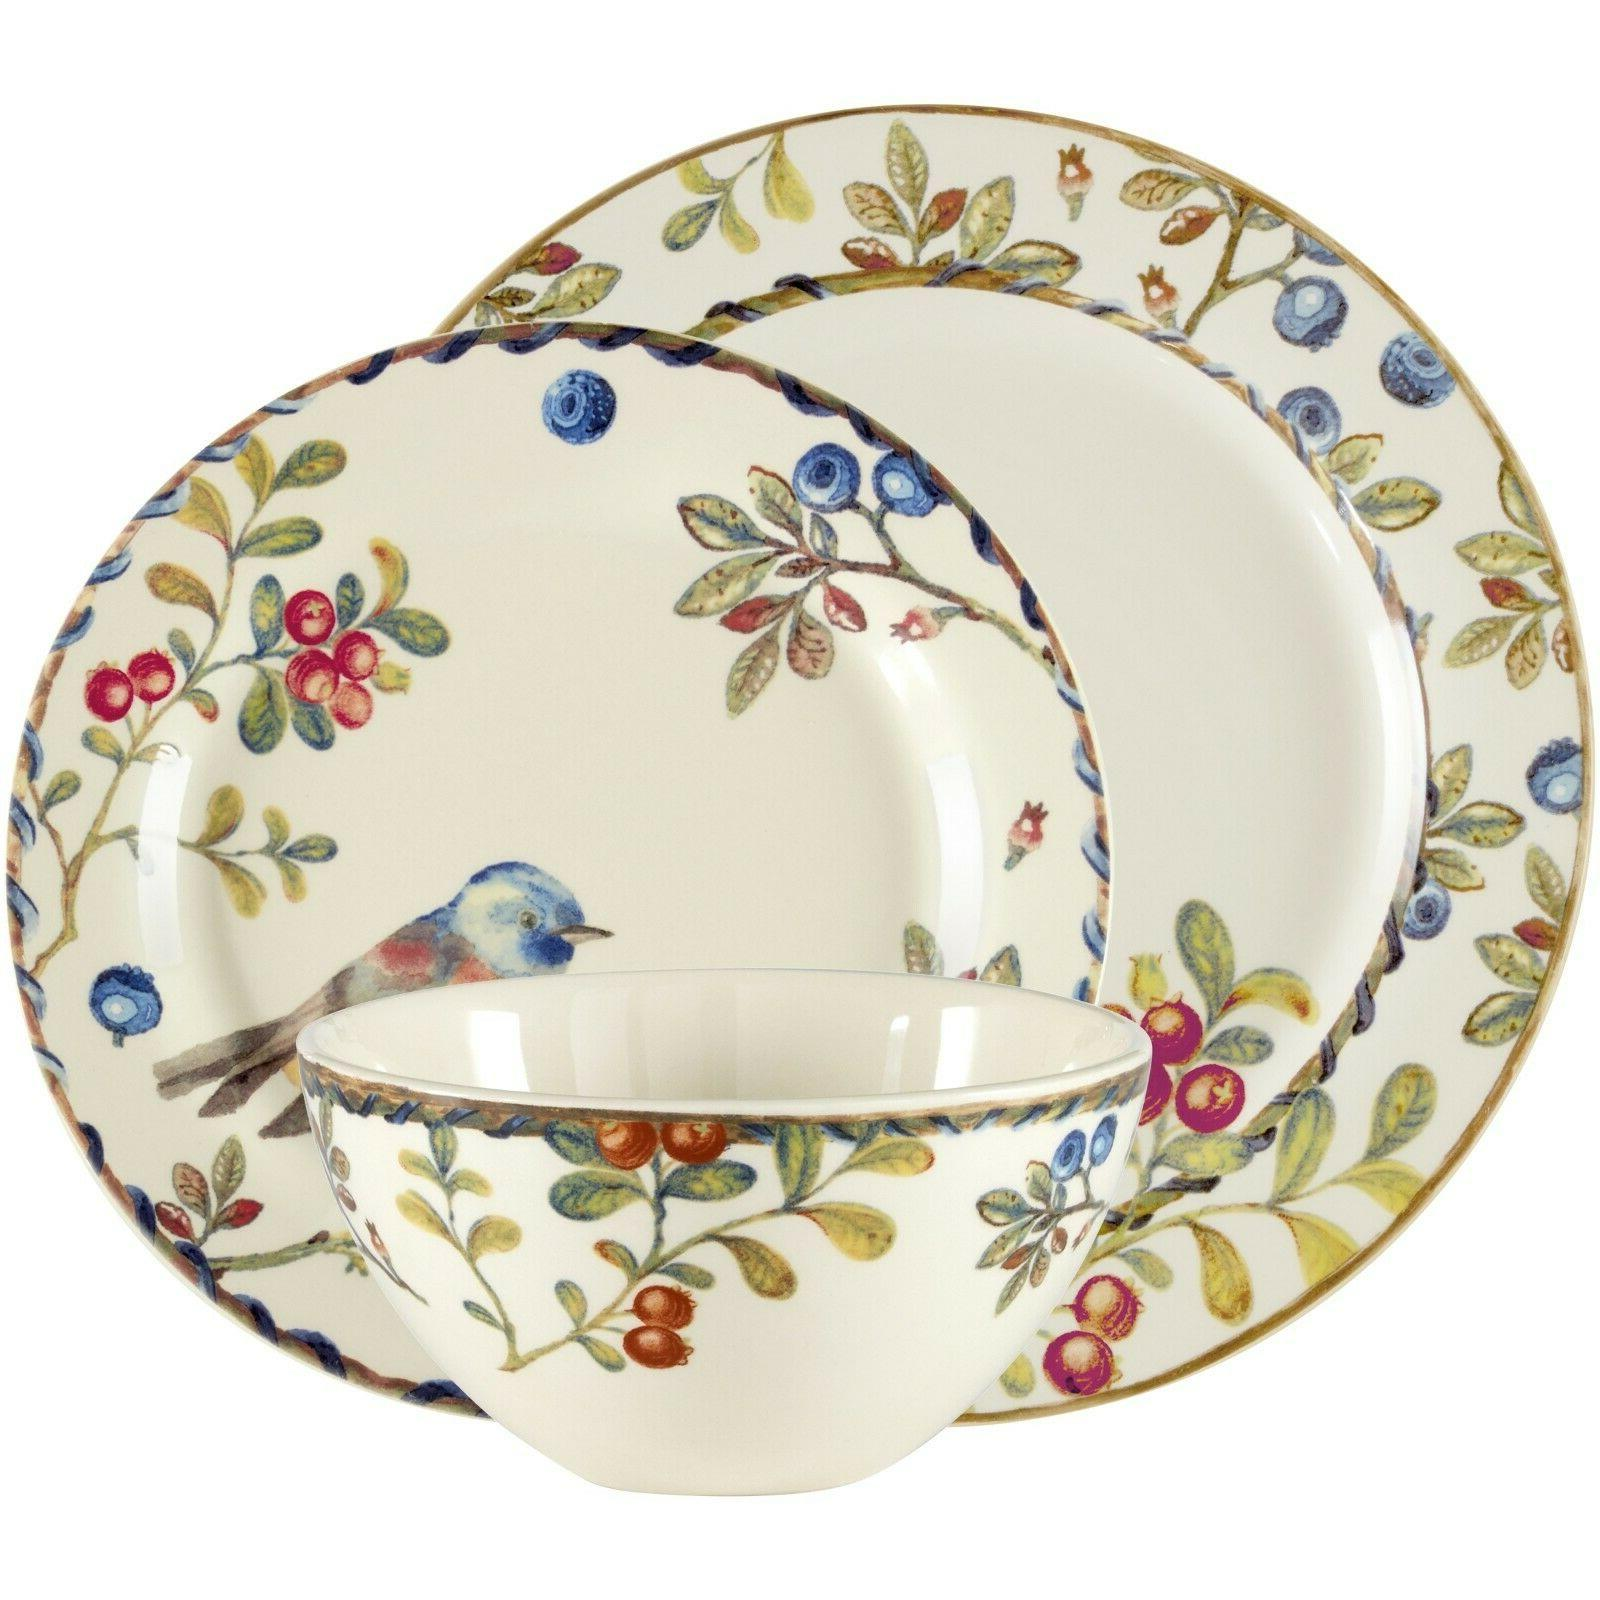 Berries and Birds 12-piece Multicolored Stoneware Dinnerware Set